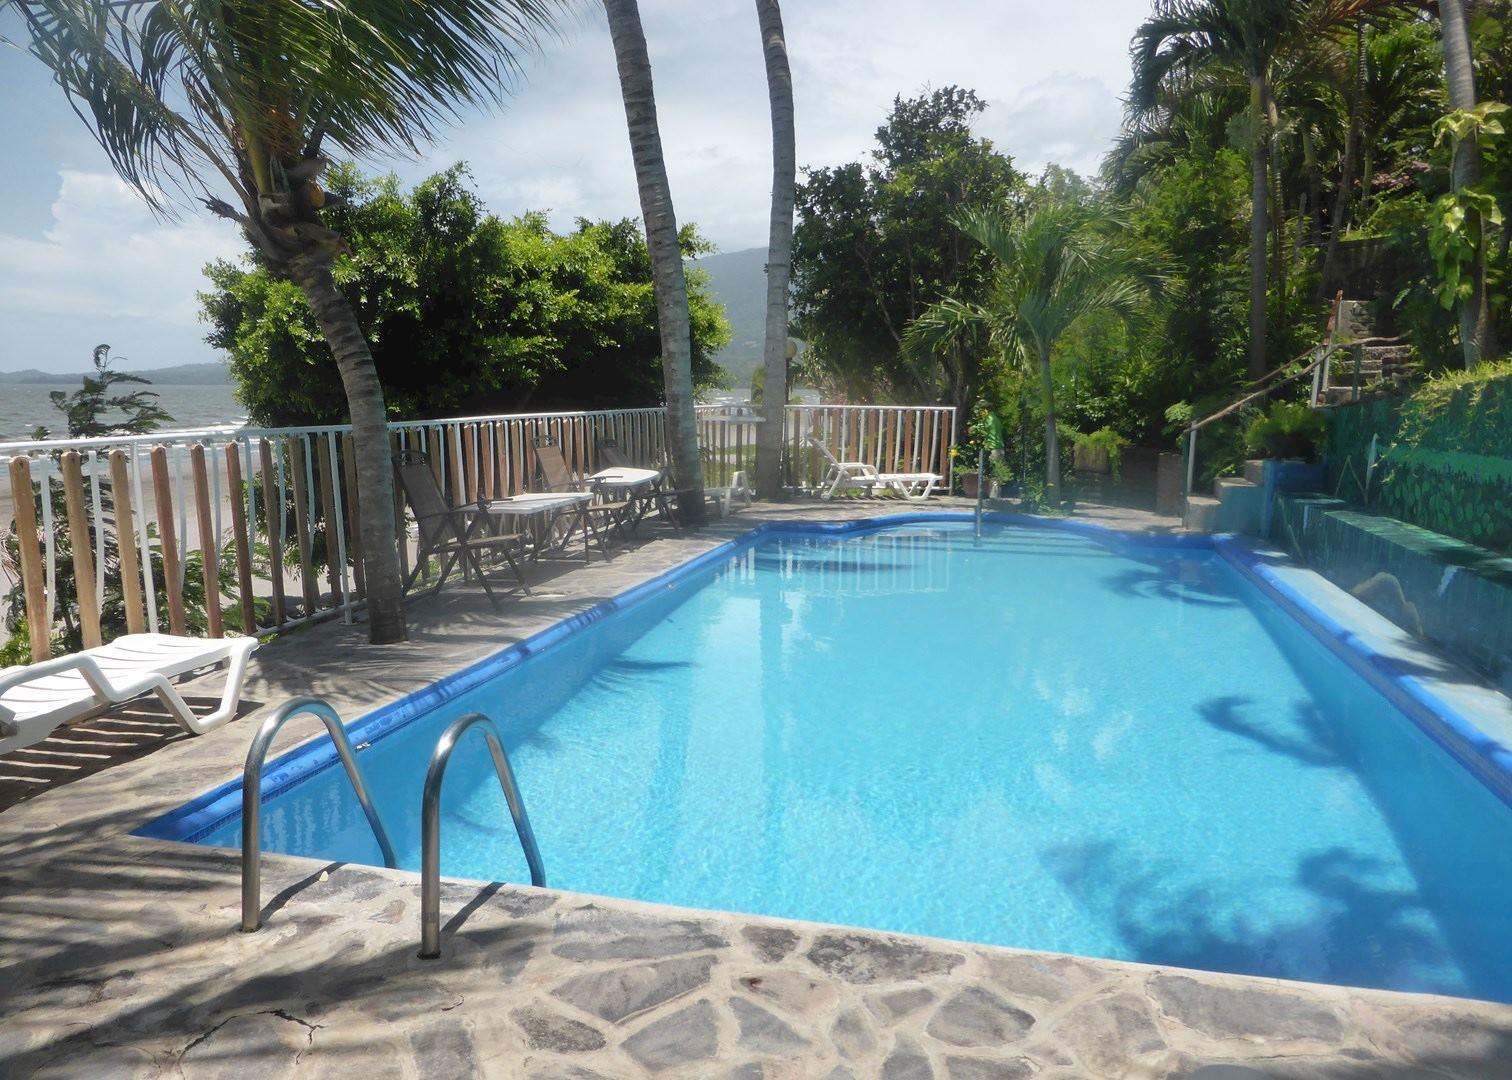 Hotel Villa Paraiso Ometepe Island